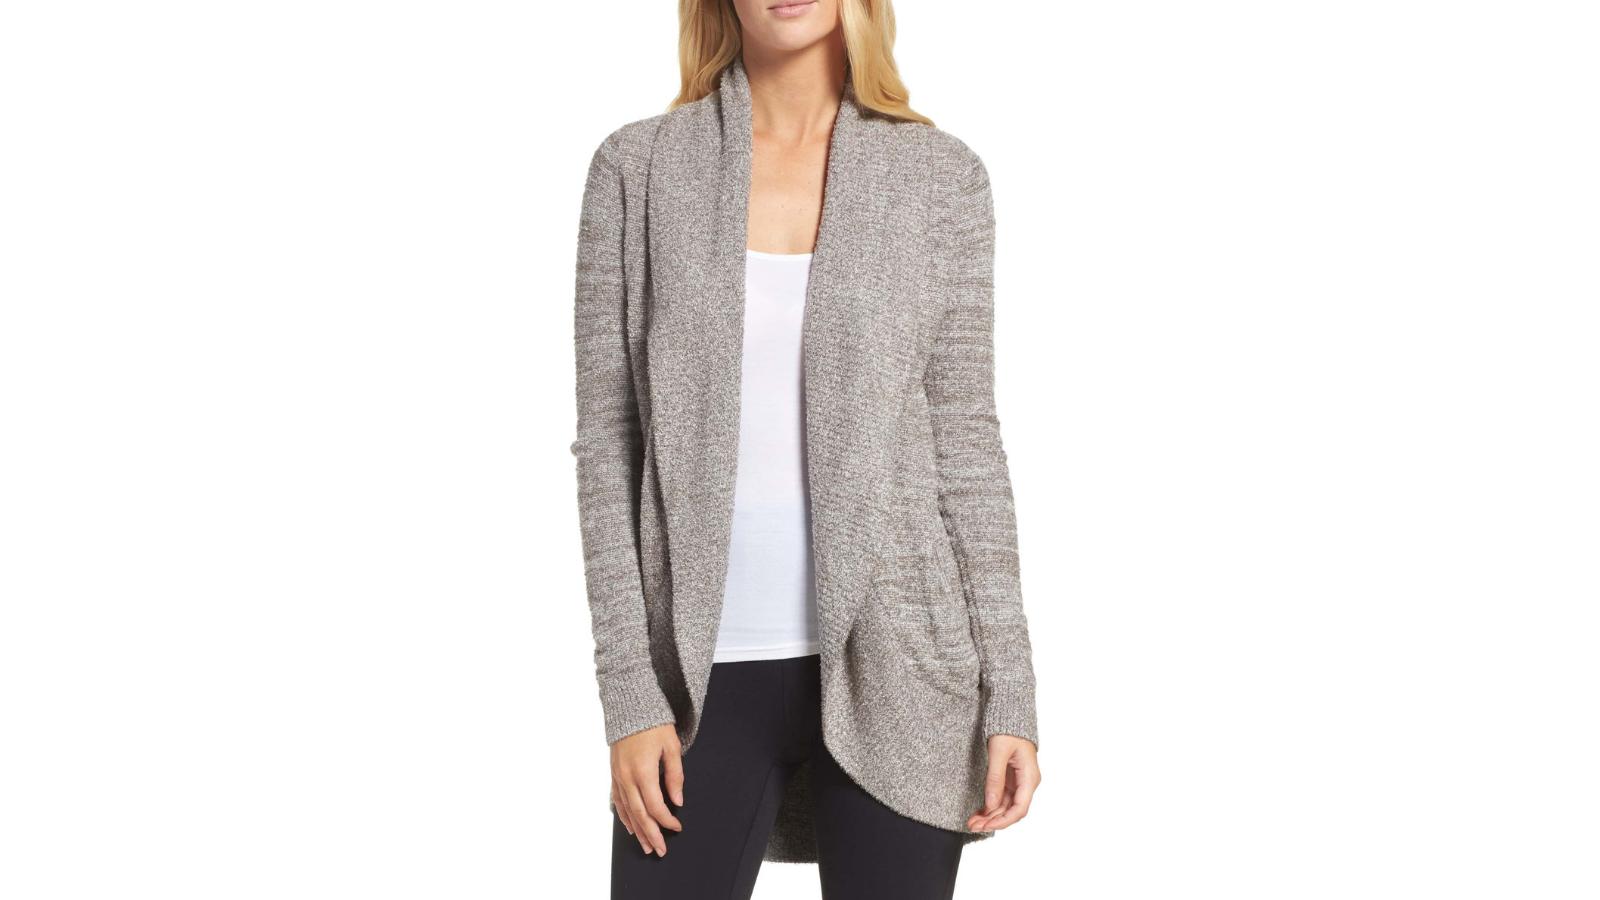 Womens Plain Off White Cream Blazer Light Jacket Size 16-26 *LICK* Exclusive